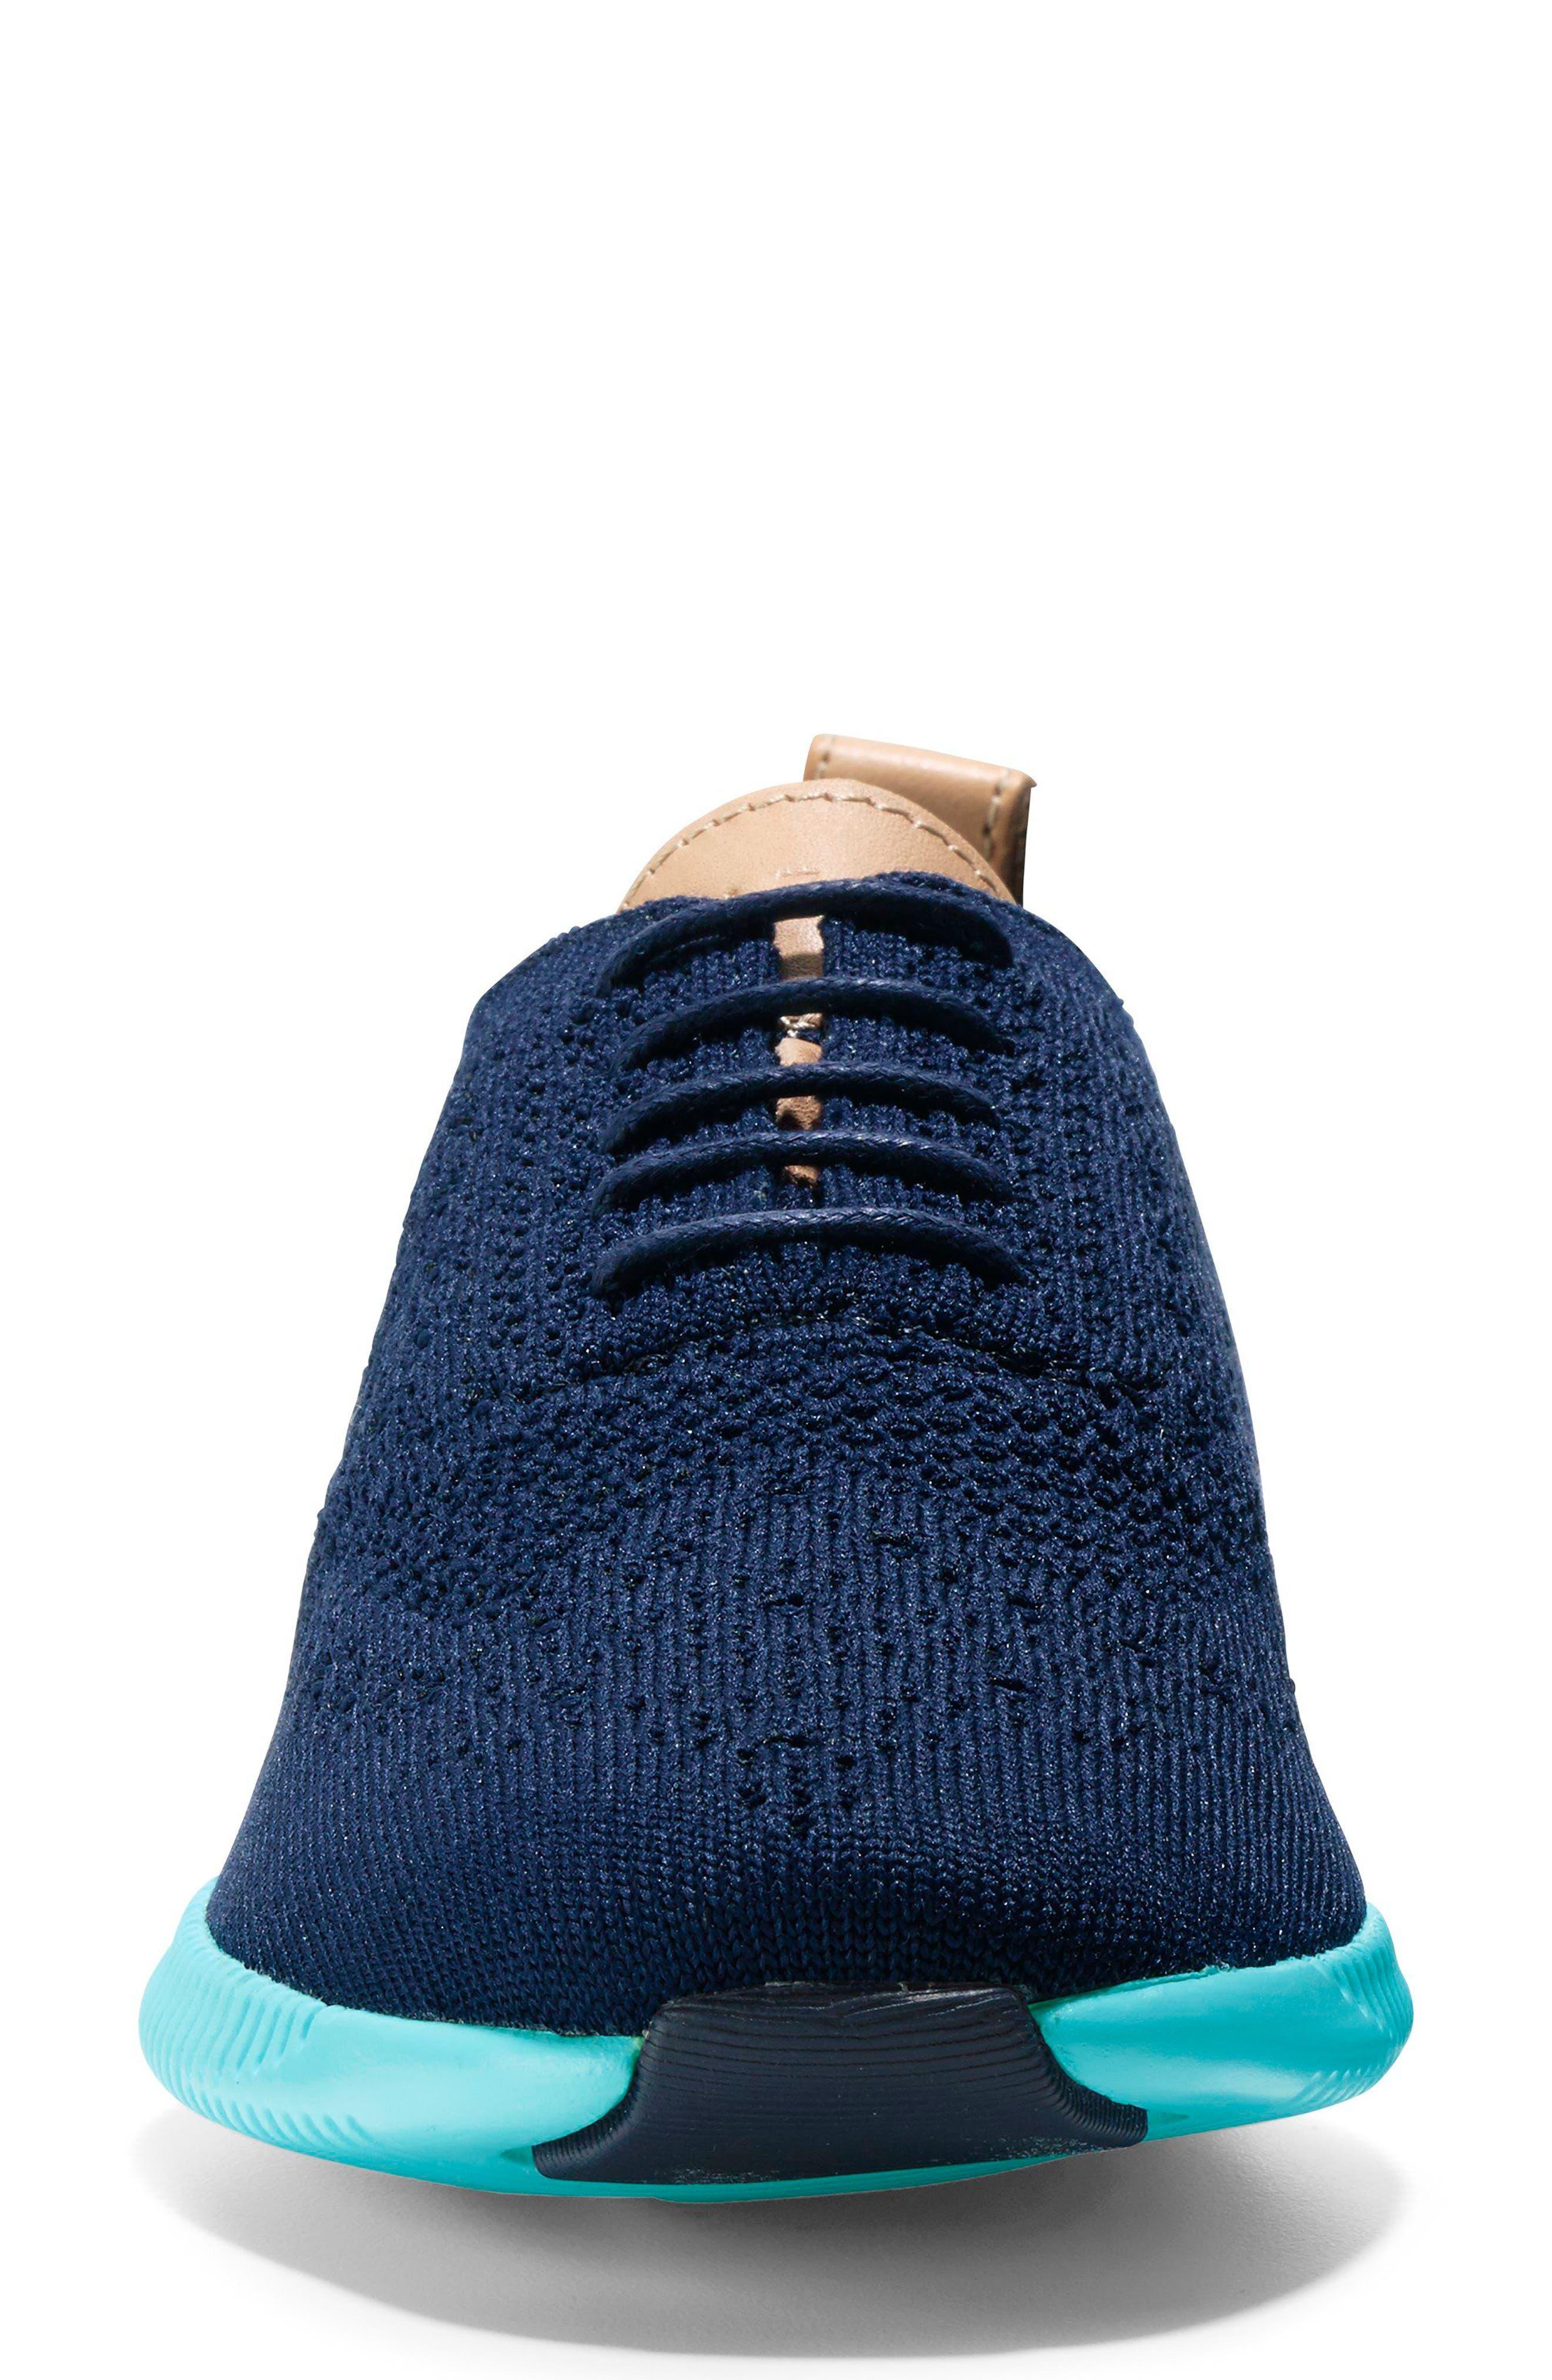 2.ZERØGRAND Stitchlite Wingtip Sneaker,                             Alternate thumbnail 4, color,                             MARINE BLUE/ BLUEFISH FABRIC